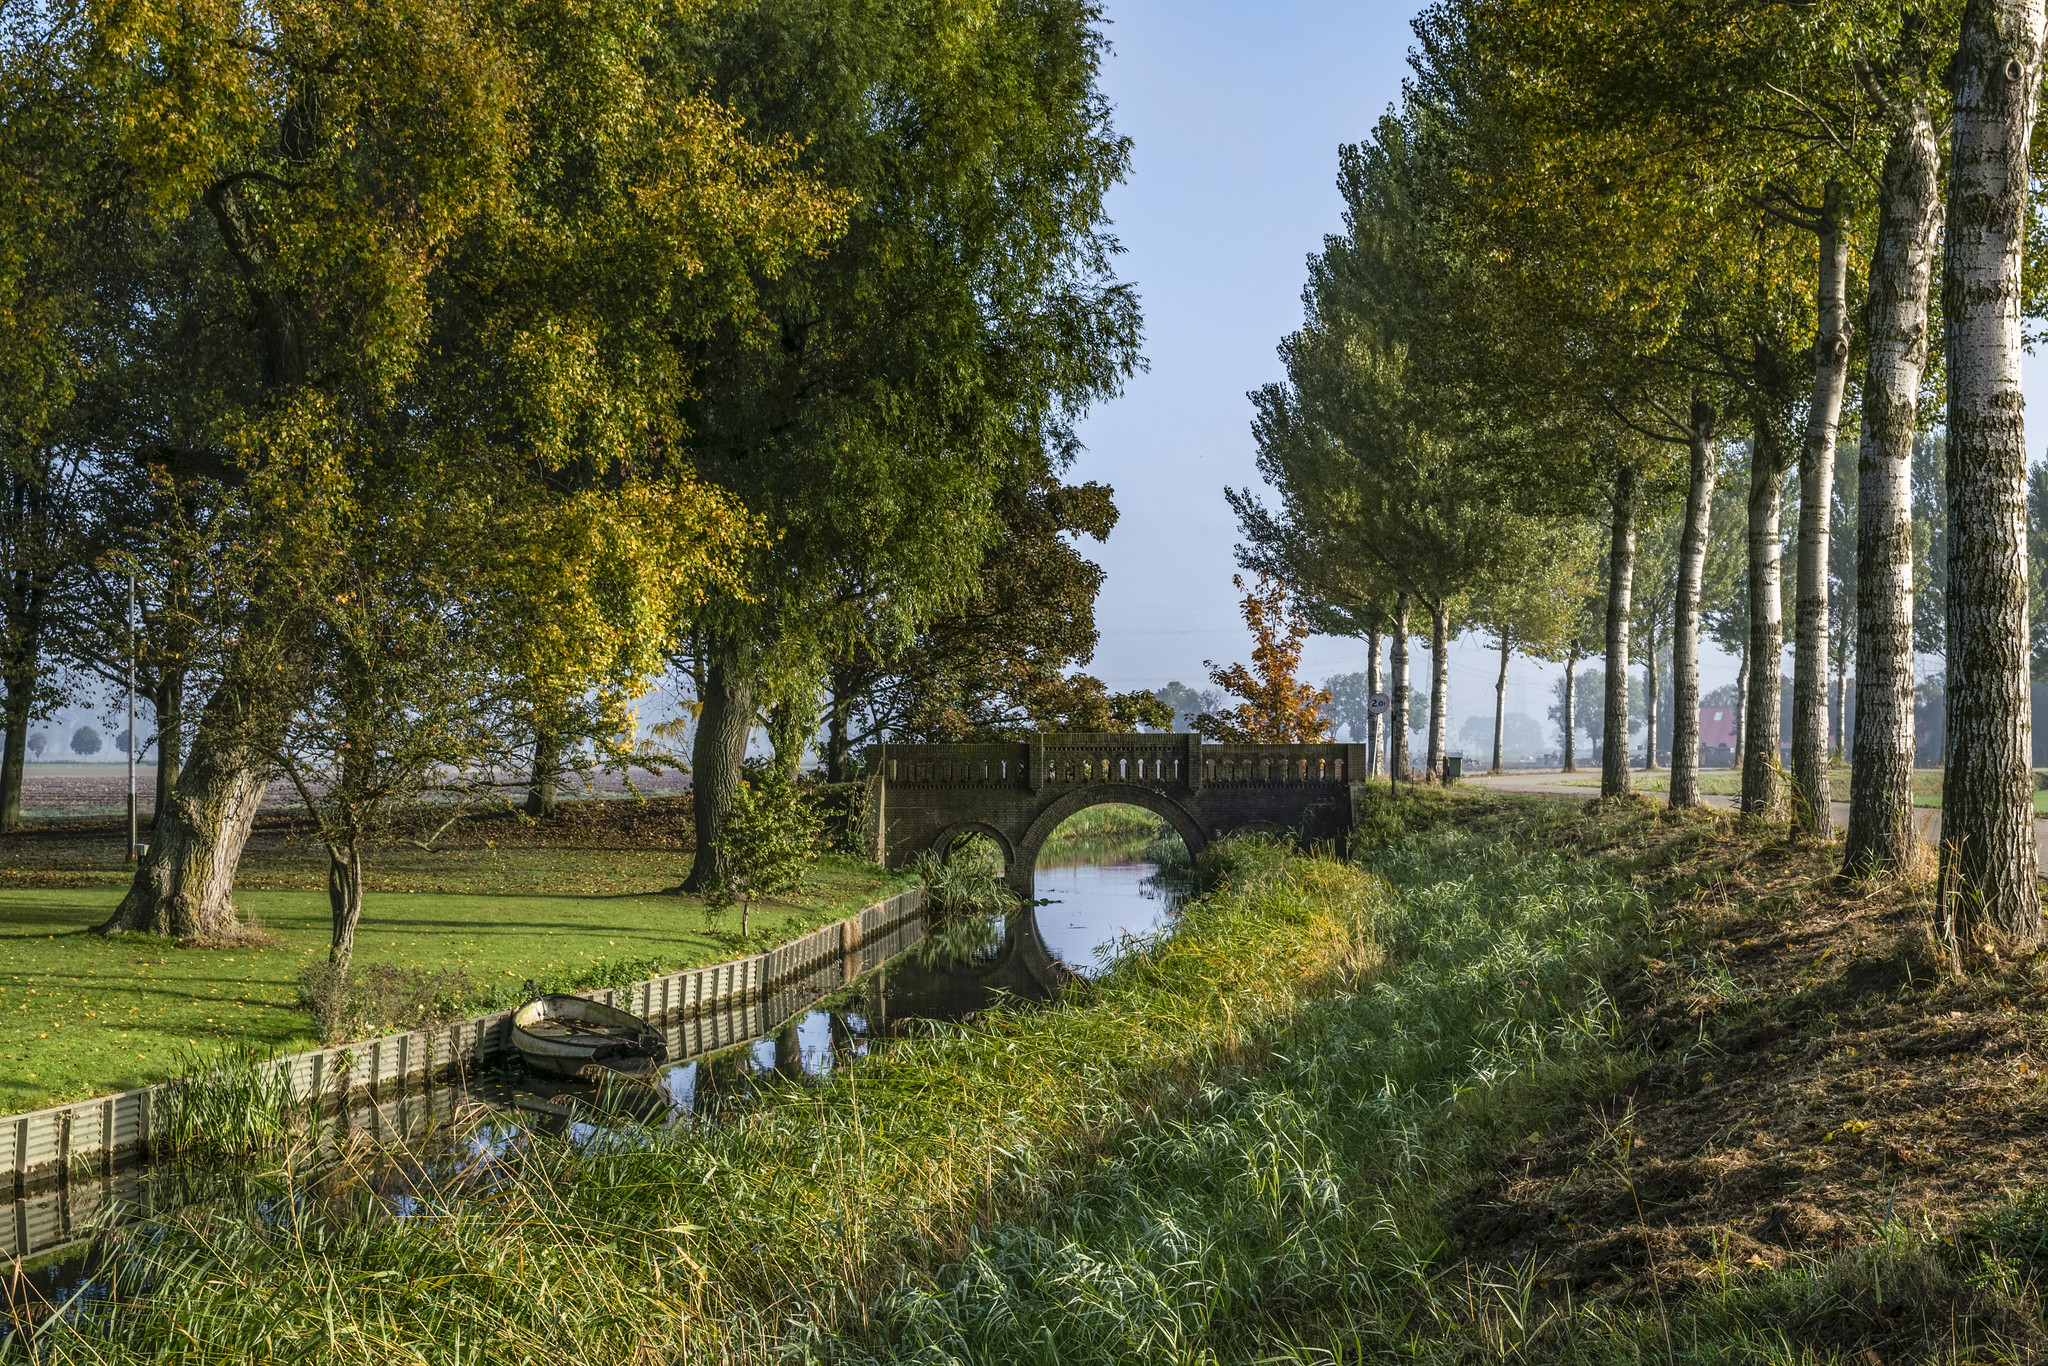 Biesbosch National Park (photo: Paul van de Velde)